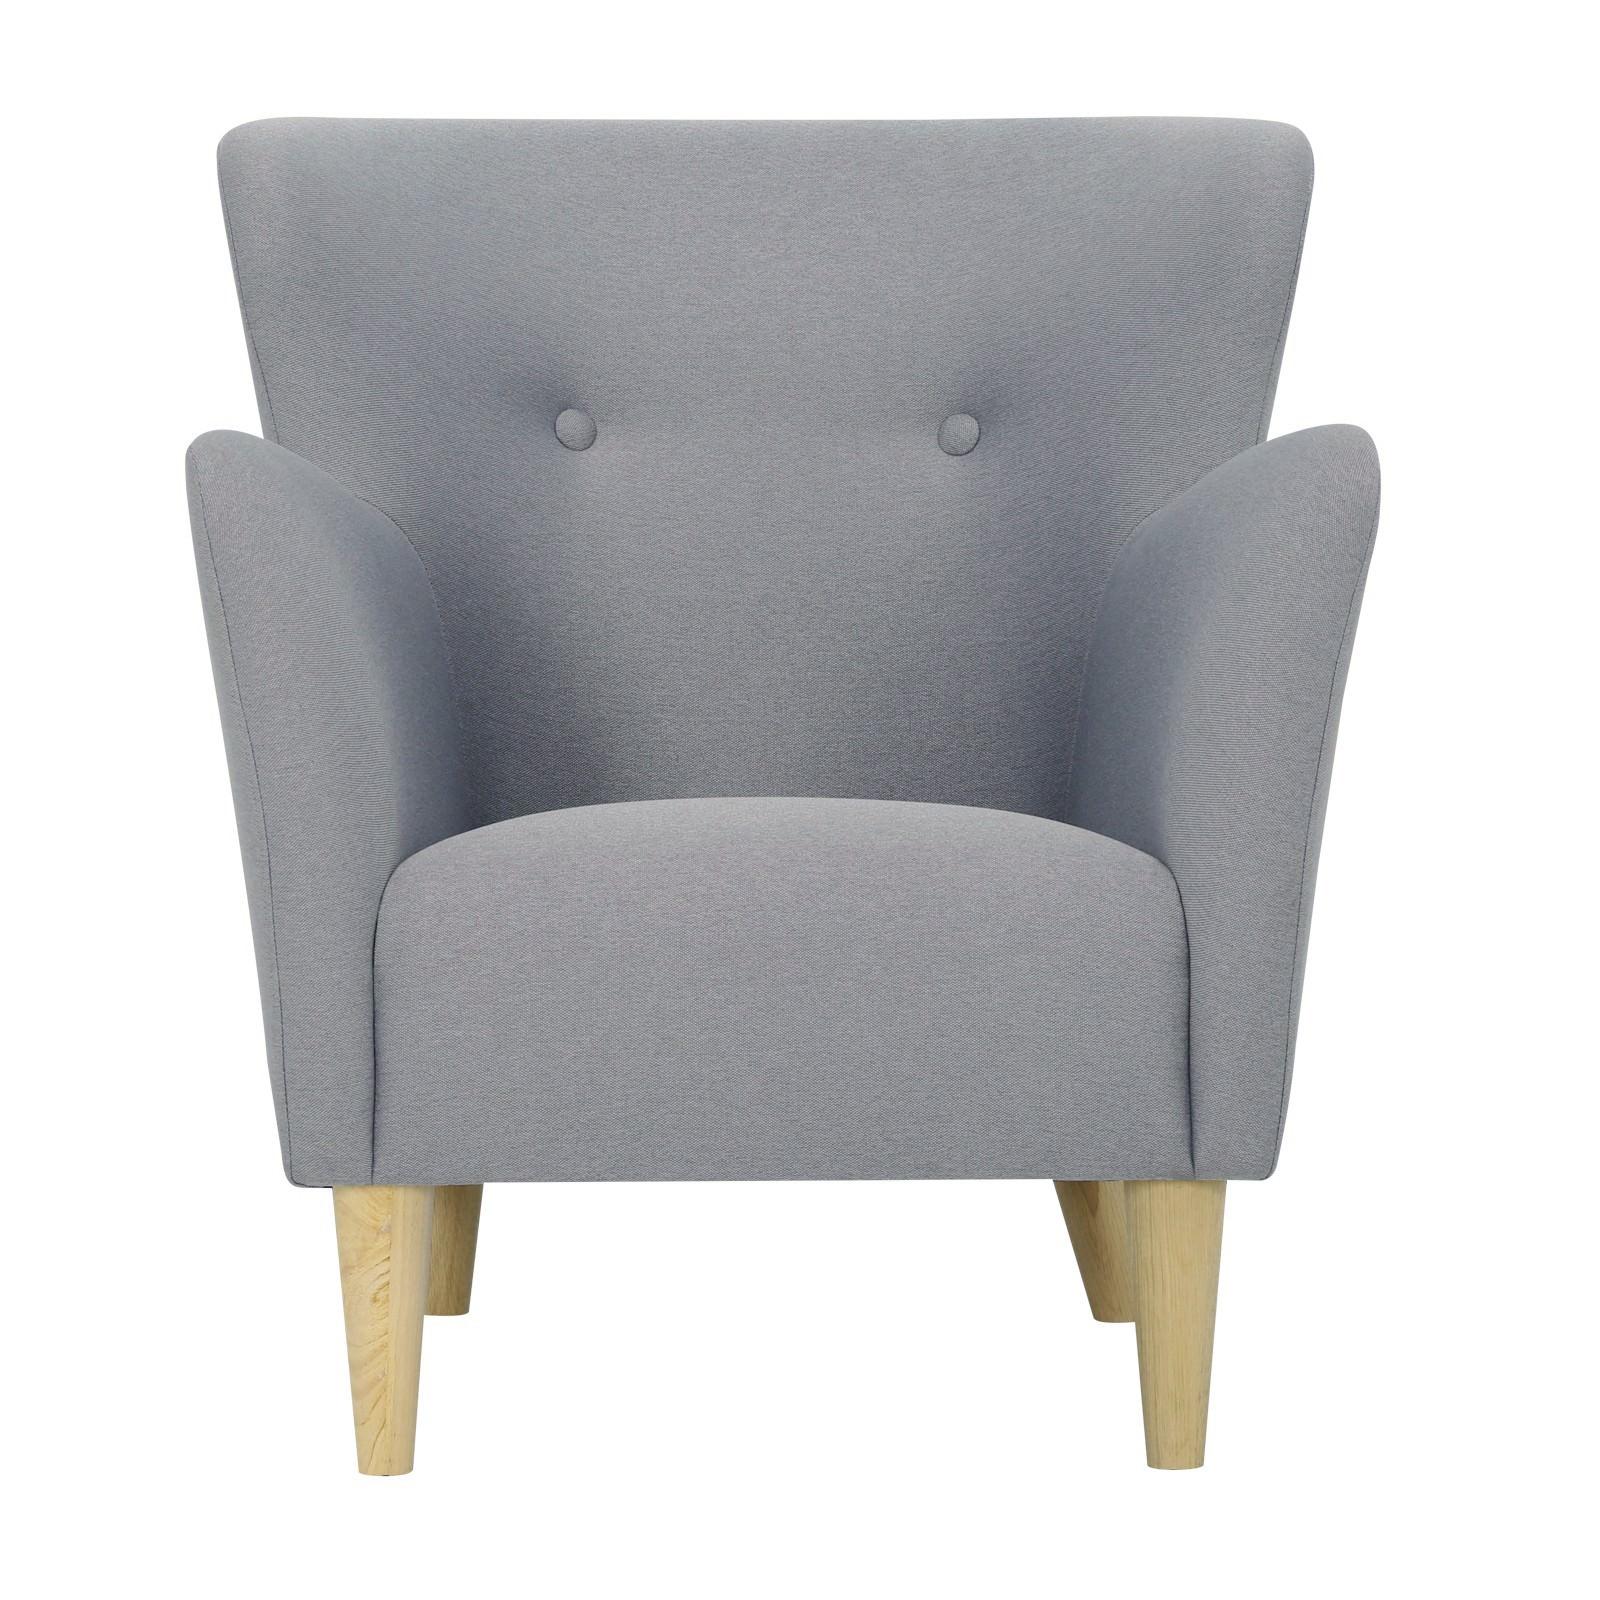 Cruiser Commercial Grade Fabric Armchair, Platinum